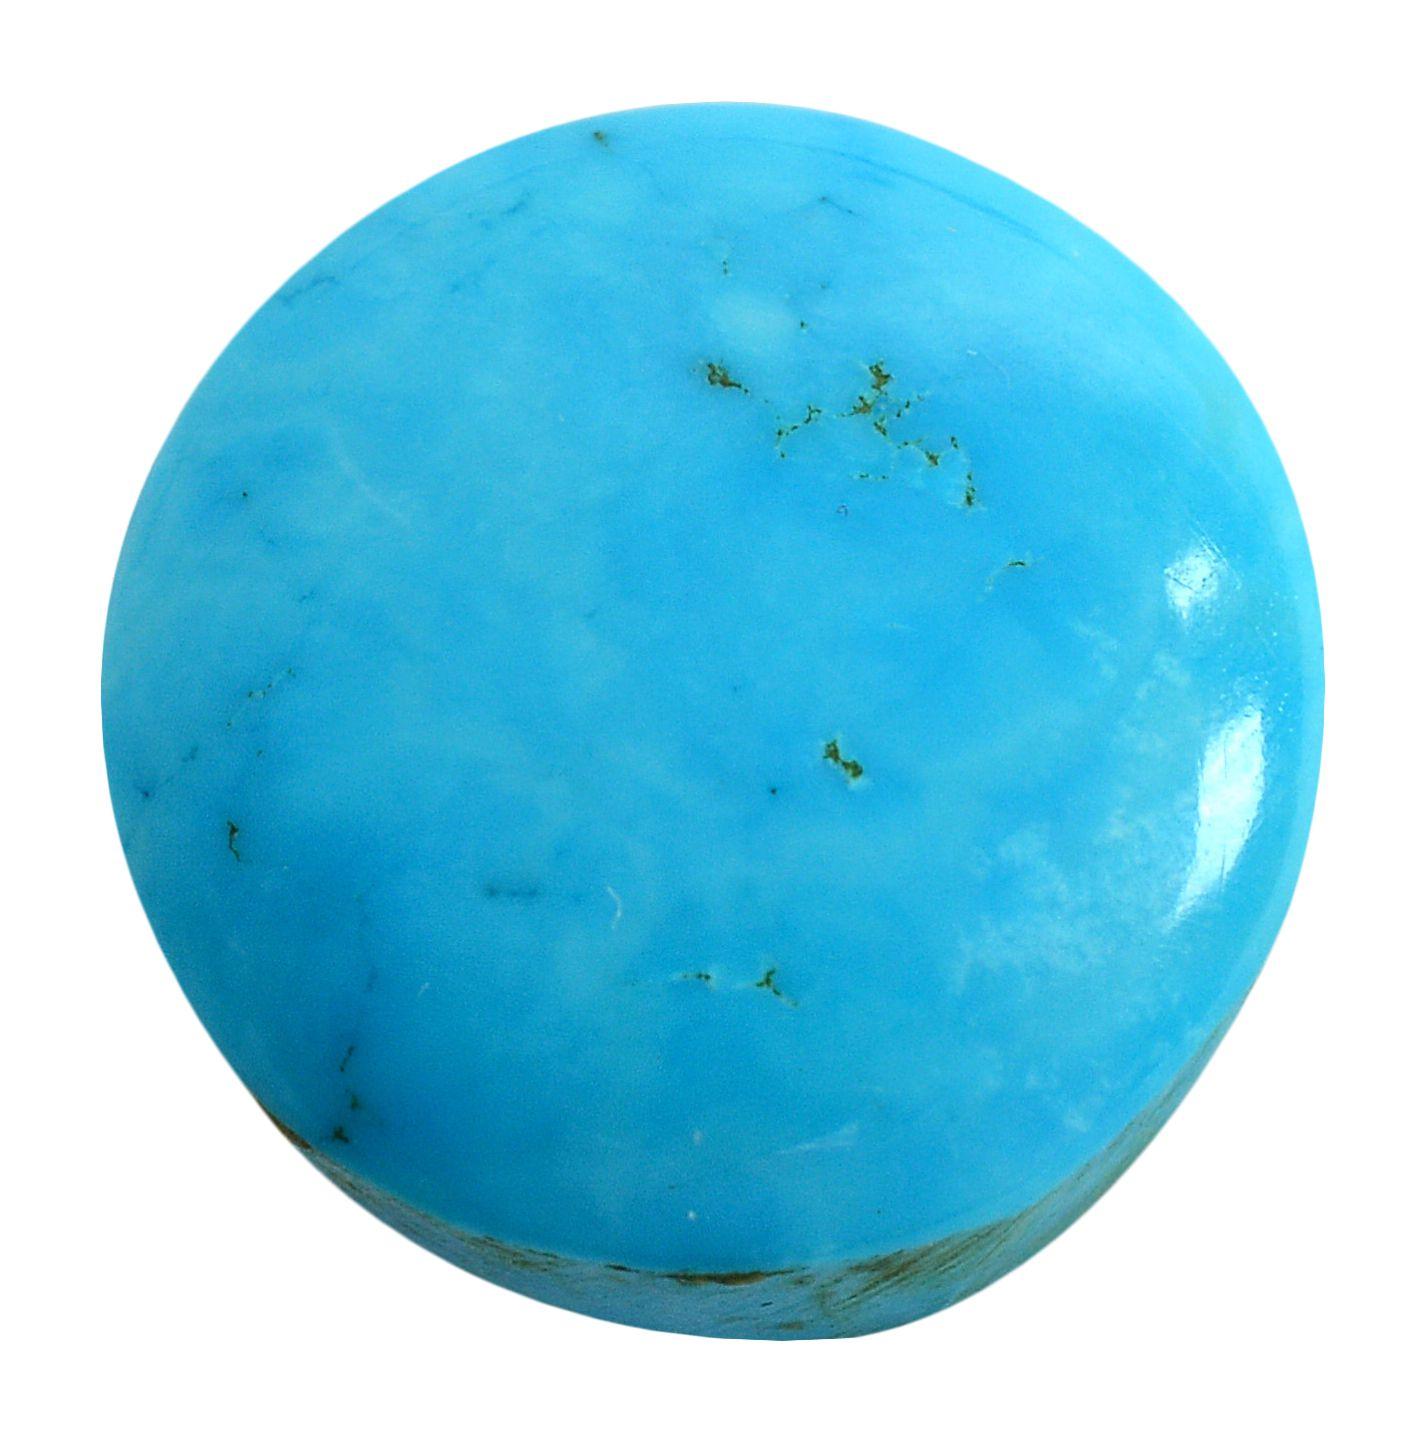 pitliya jewellers 5 -Ratti Self certified Blue Turquoise Semi-precious Gemstone